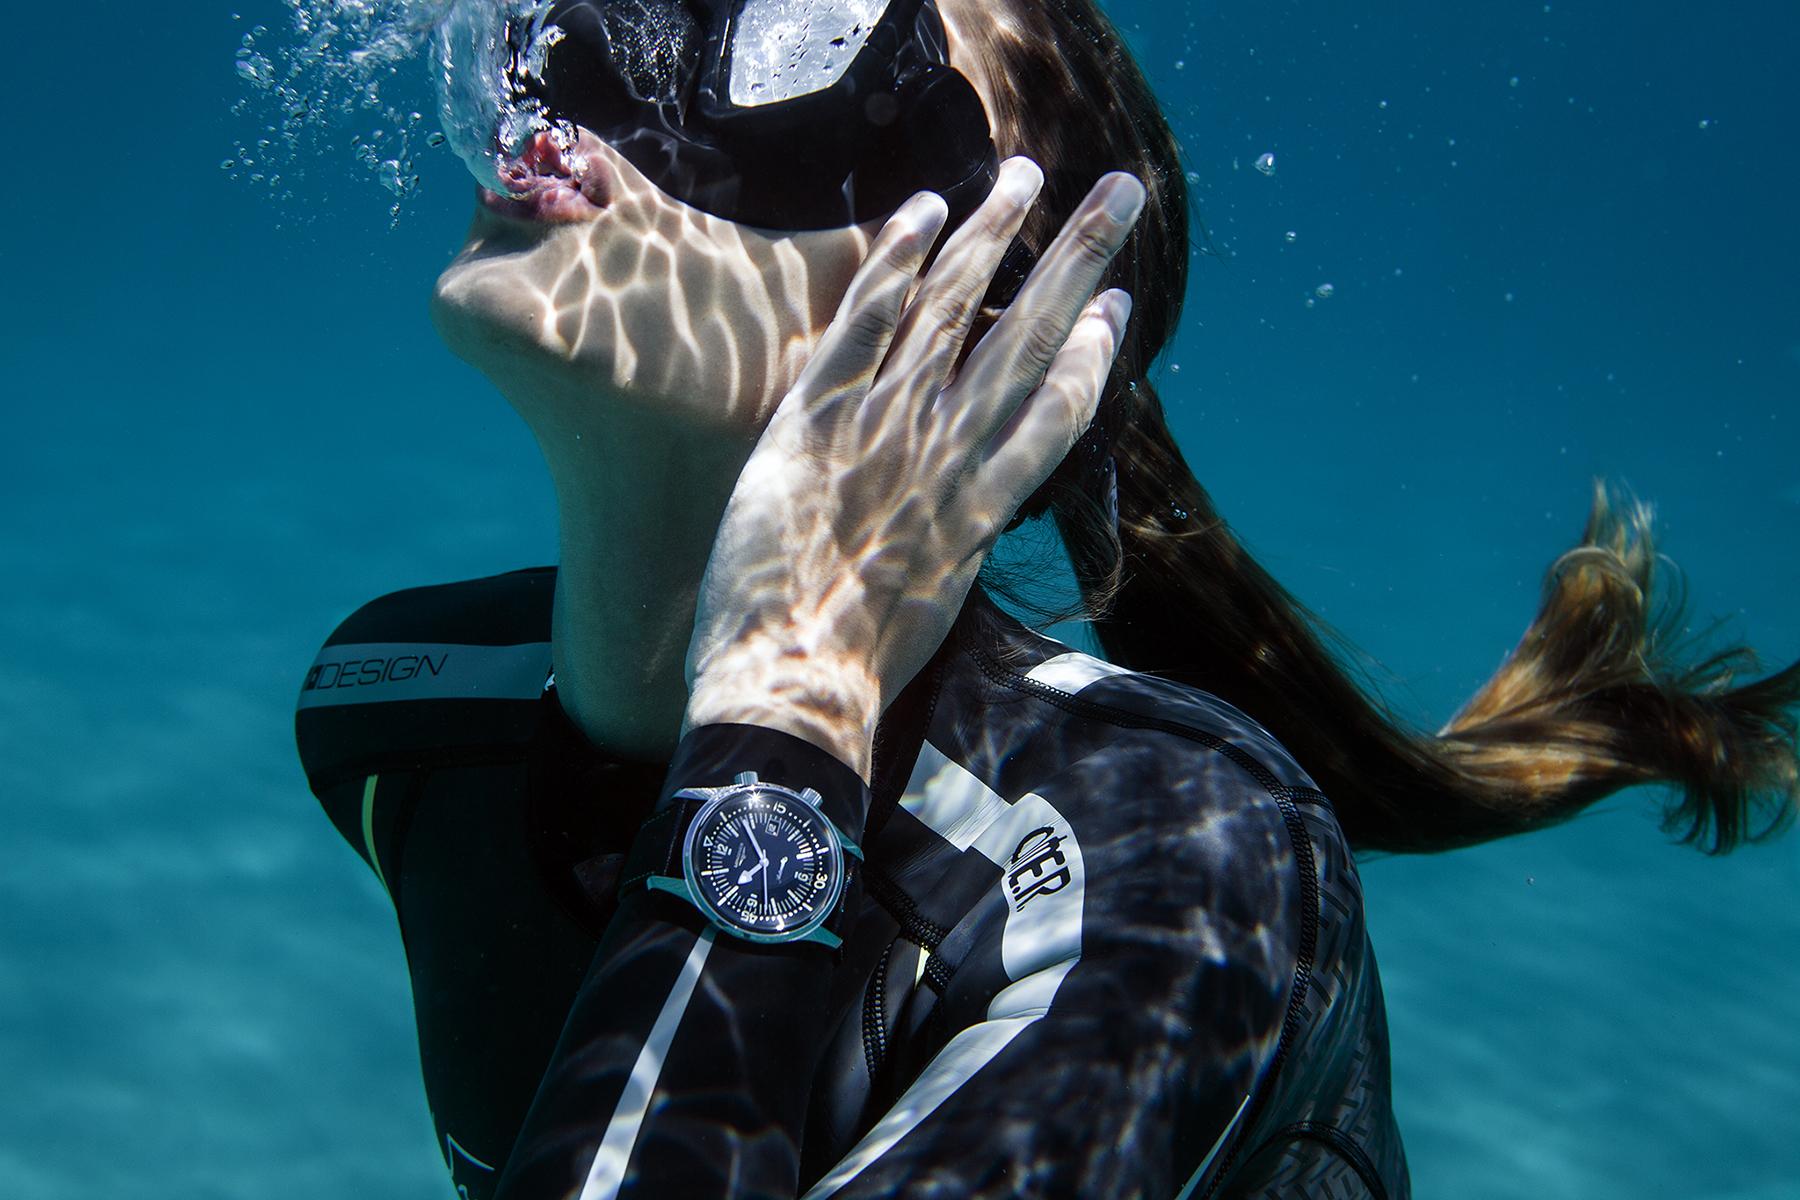 PDM 8610 / Longines legend diver ©Peter De mulder